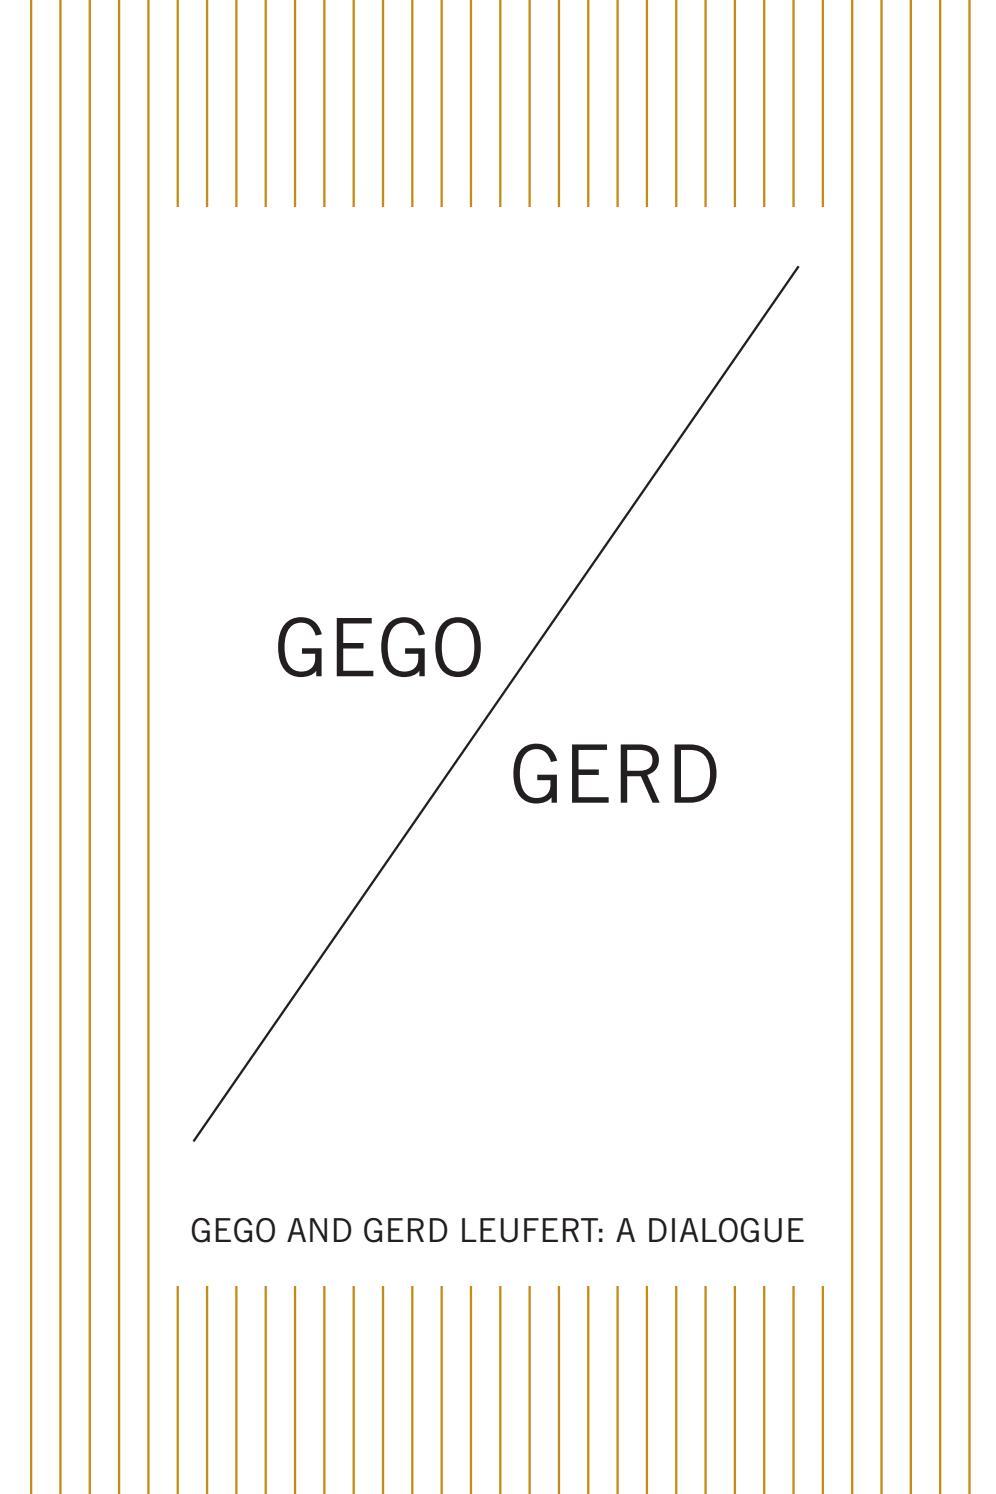 Gego & Gerd for Leubsdorf Gallery by Hunter College Art Galleries ...